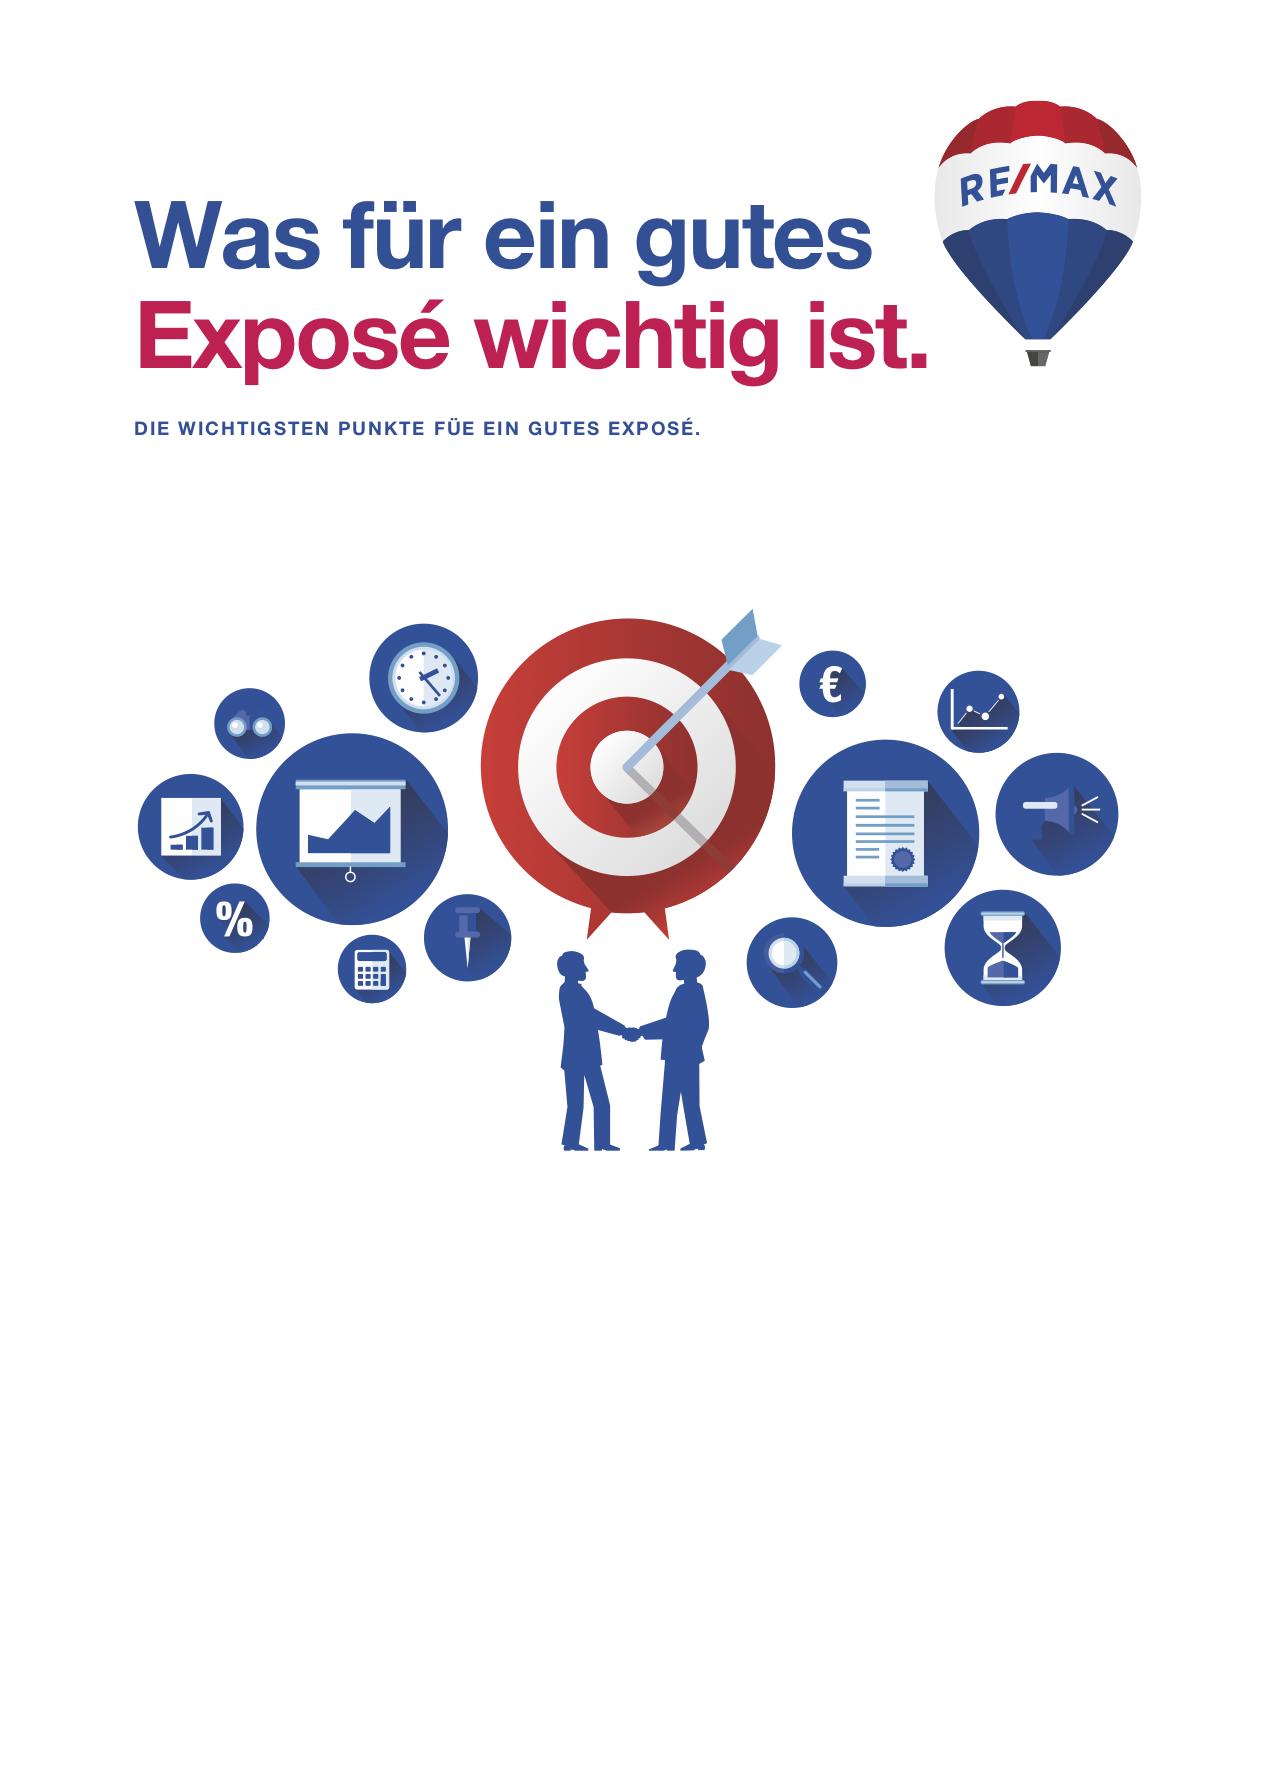 Checkliste-RE_MAX-Expose